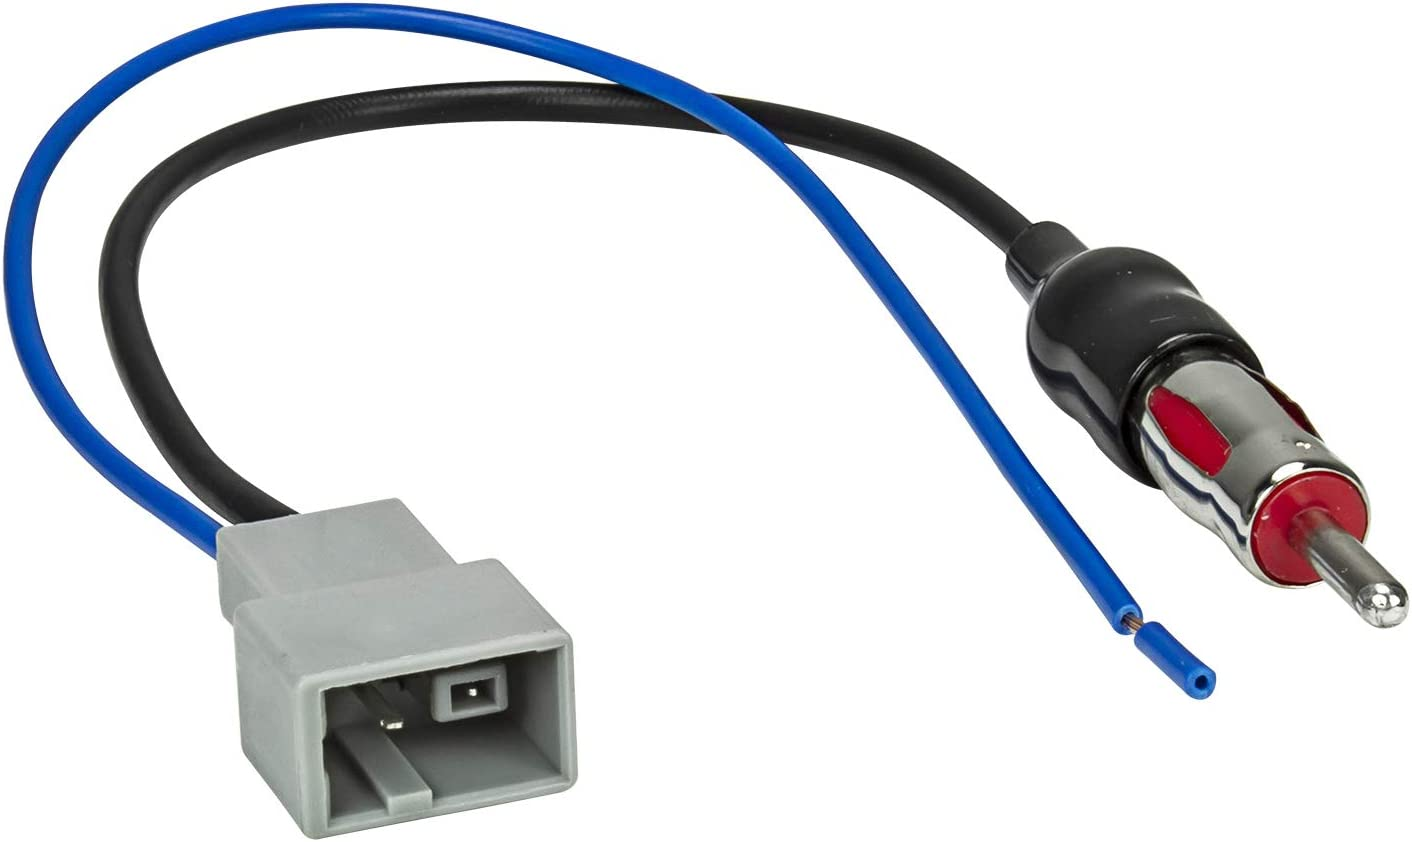 Tomzz Audio 1517 001 Antennenadapter Gt13 Din Kompatibel Mit Honda Civic Fit Jazz Pilot Nissan Navara